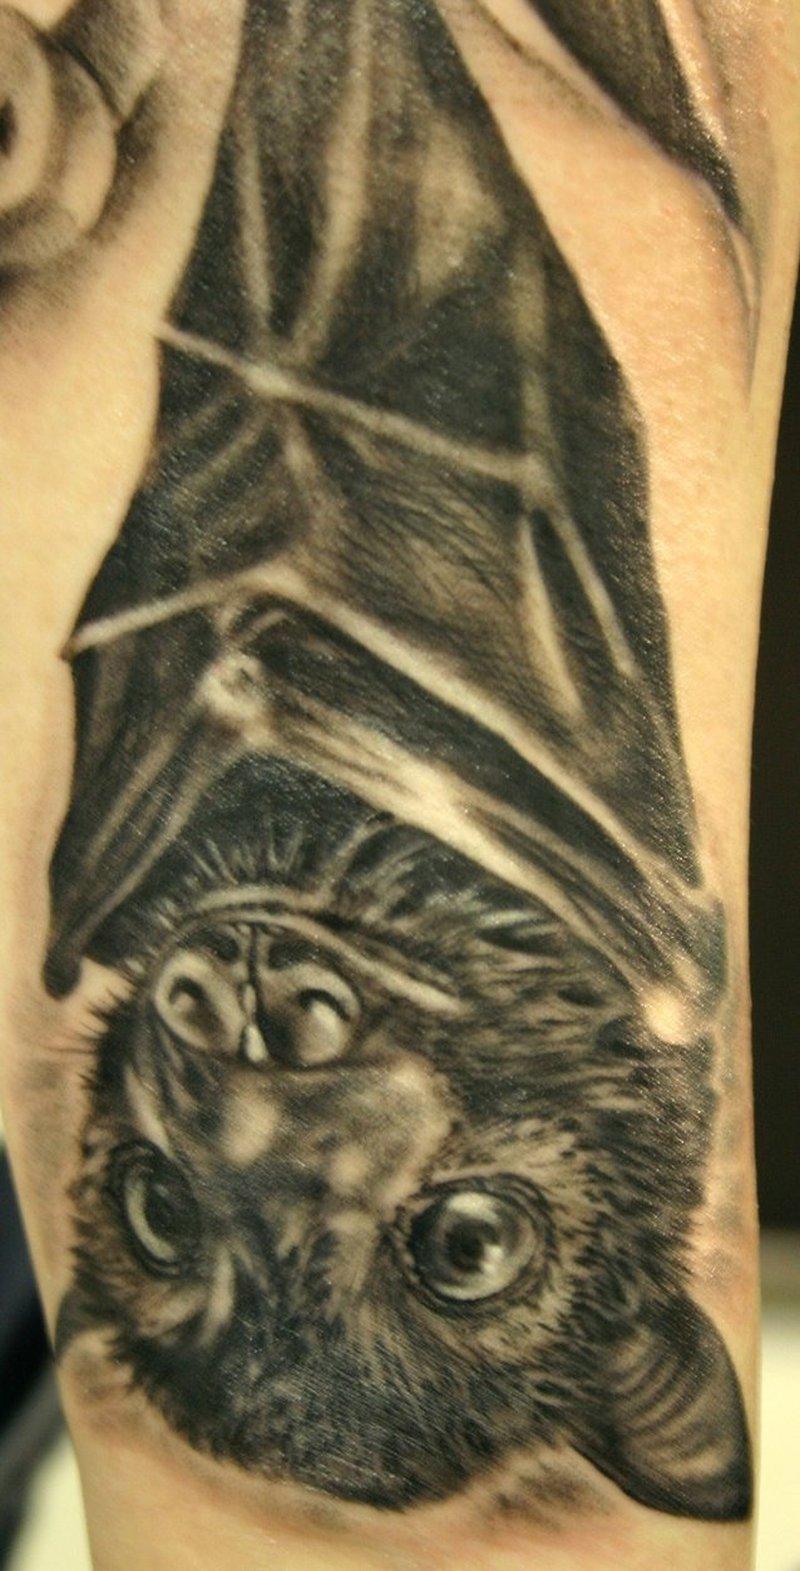 Baby bat tattoo design